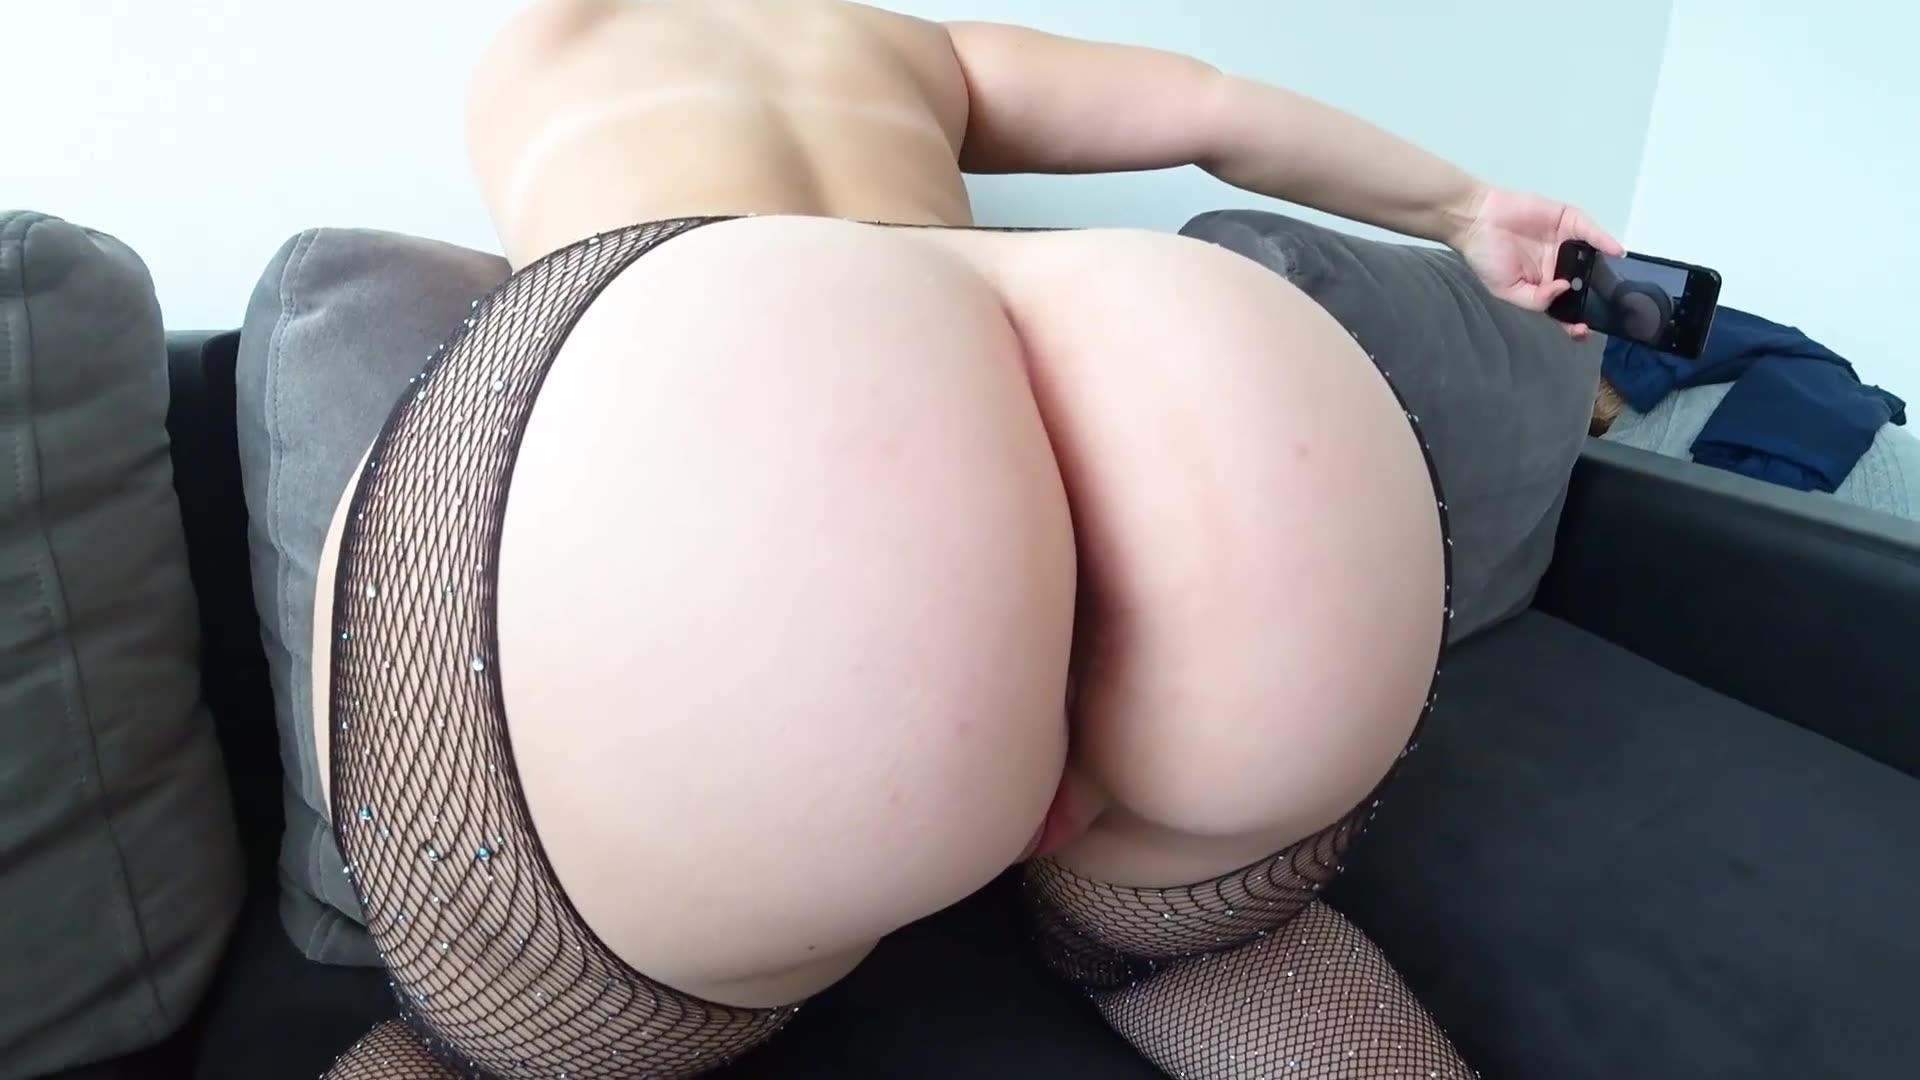 Crazy Creampie For Big Tits And Big Ass Pornstar Patty Michova